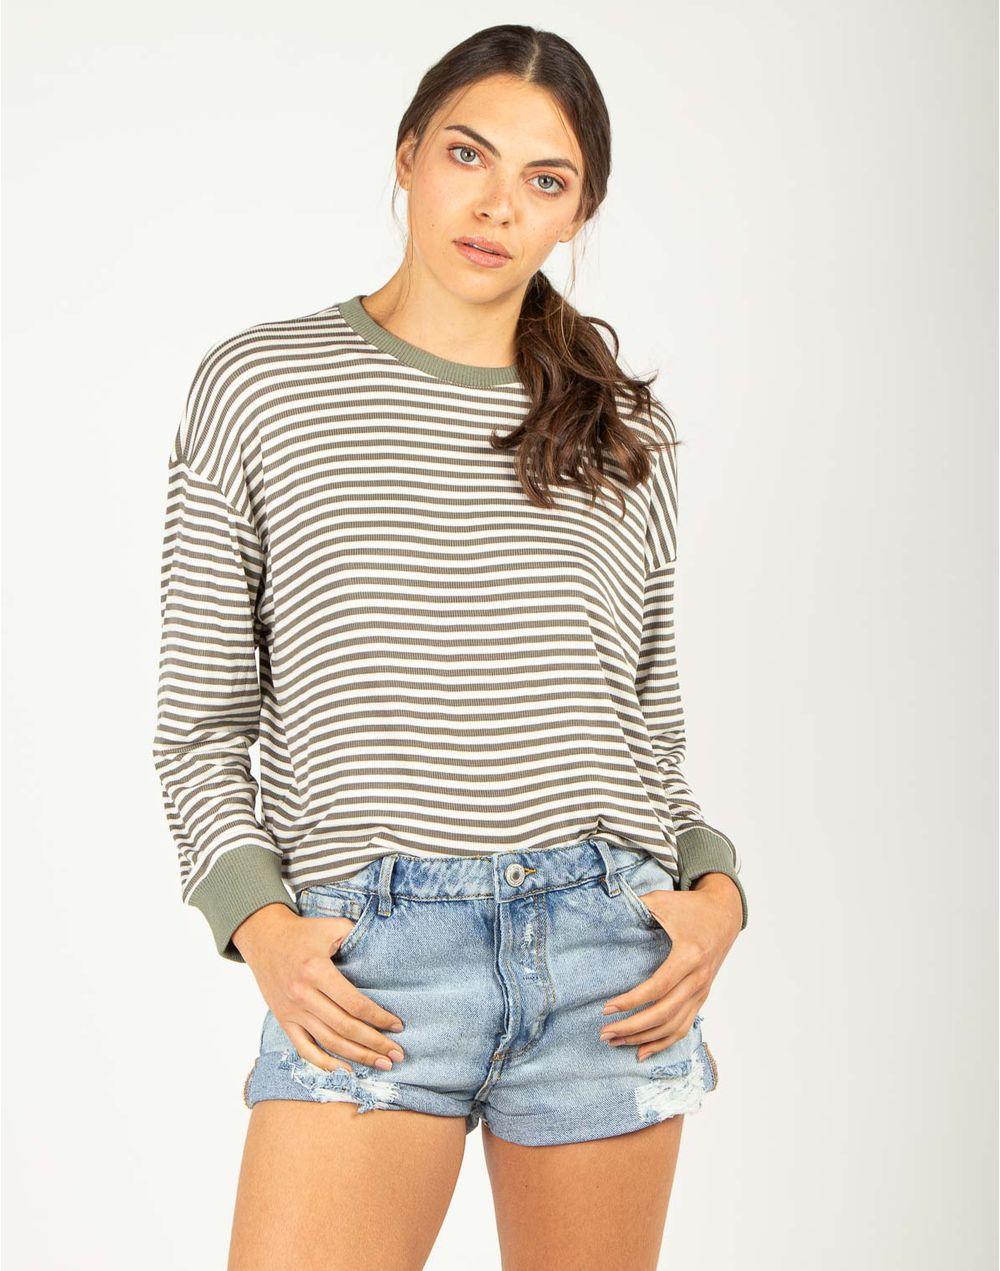 camiseta-180262-verde-1.jpg